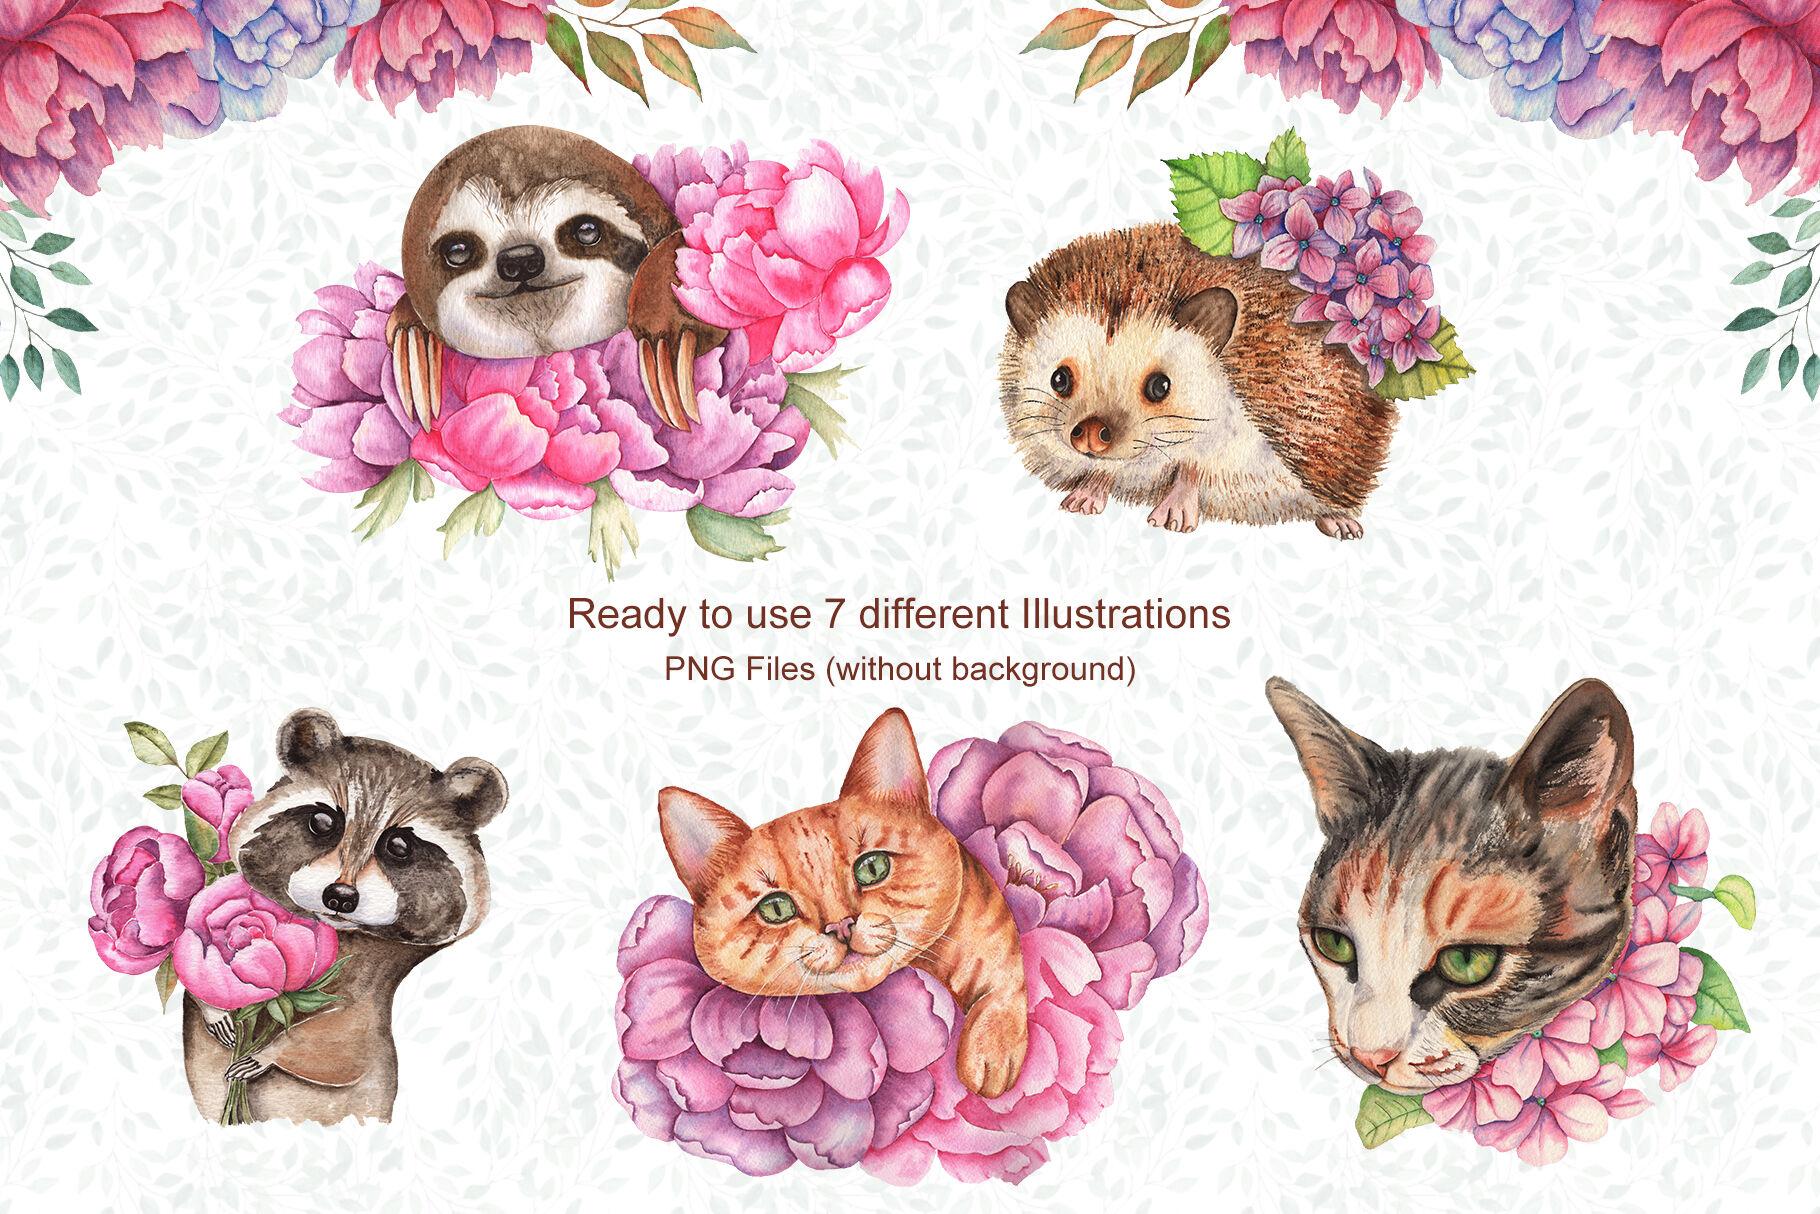 高清手绘花卉和动物水彩画图片集 Watercolor Flowers and Animals Set插图